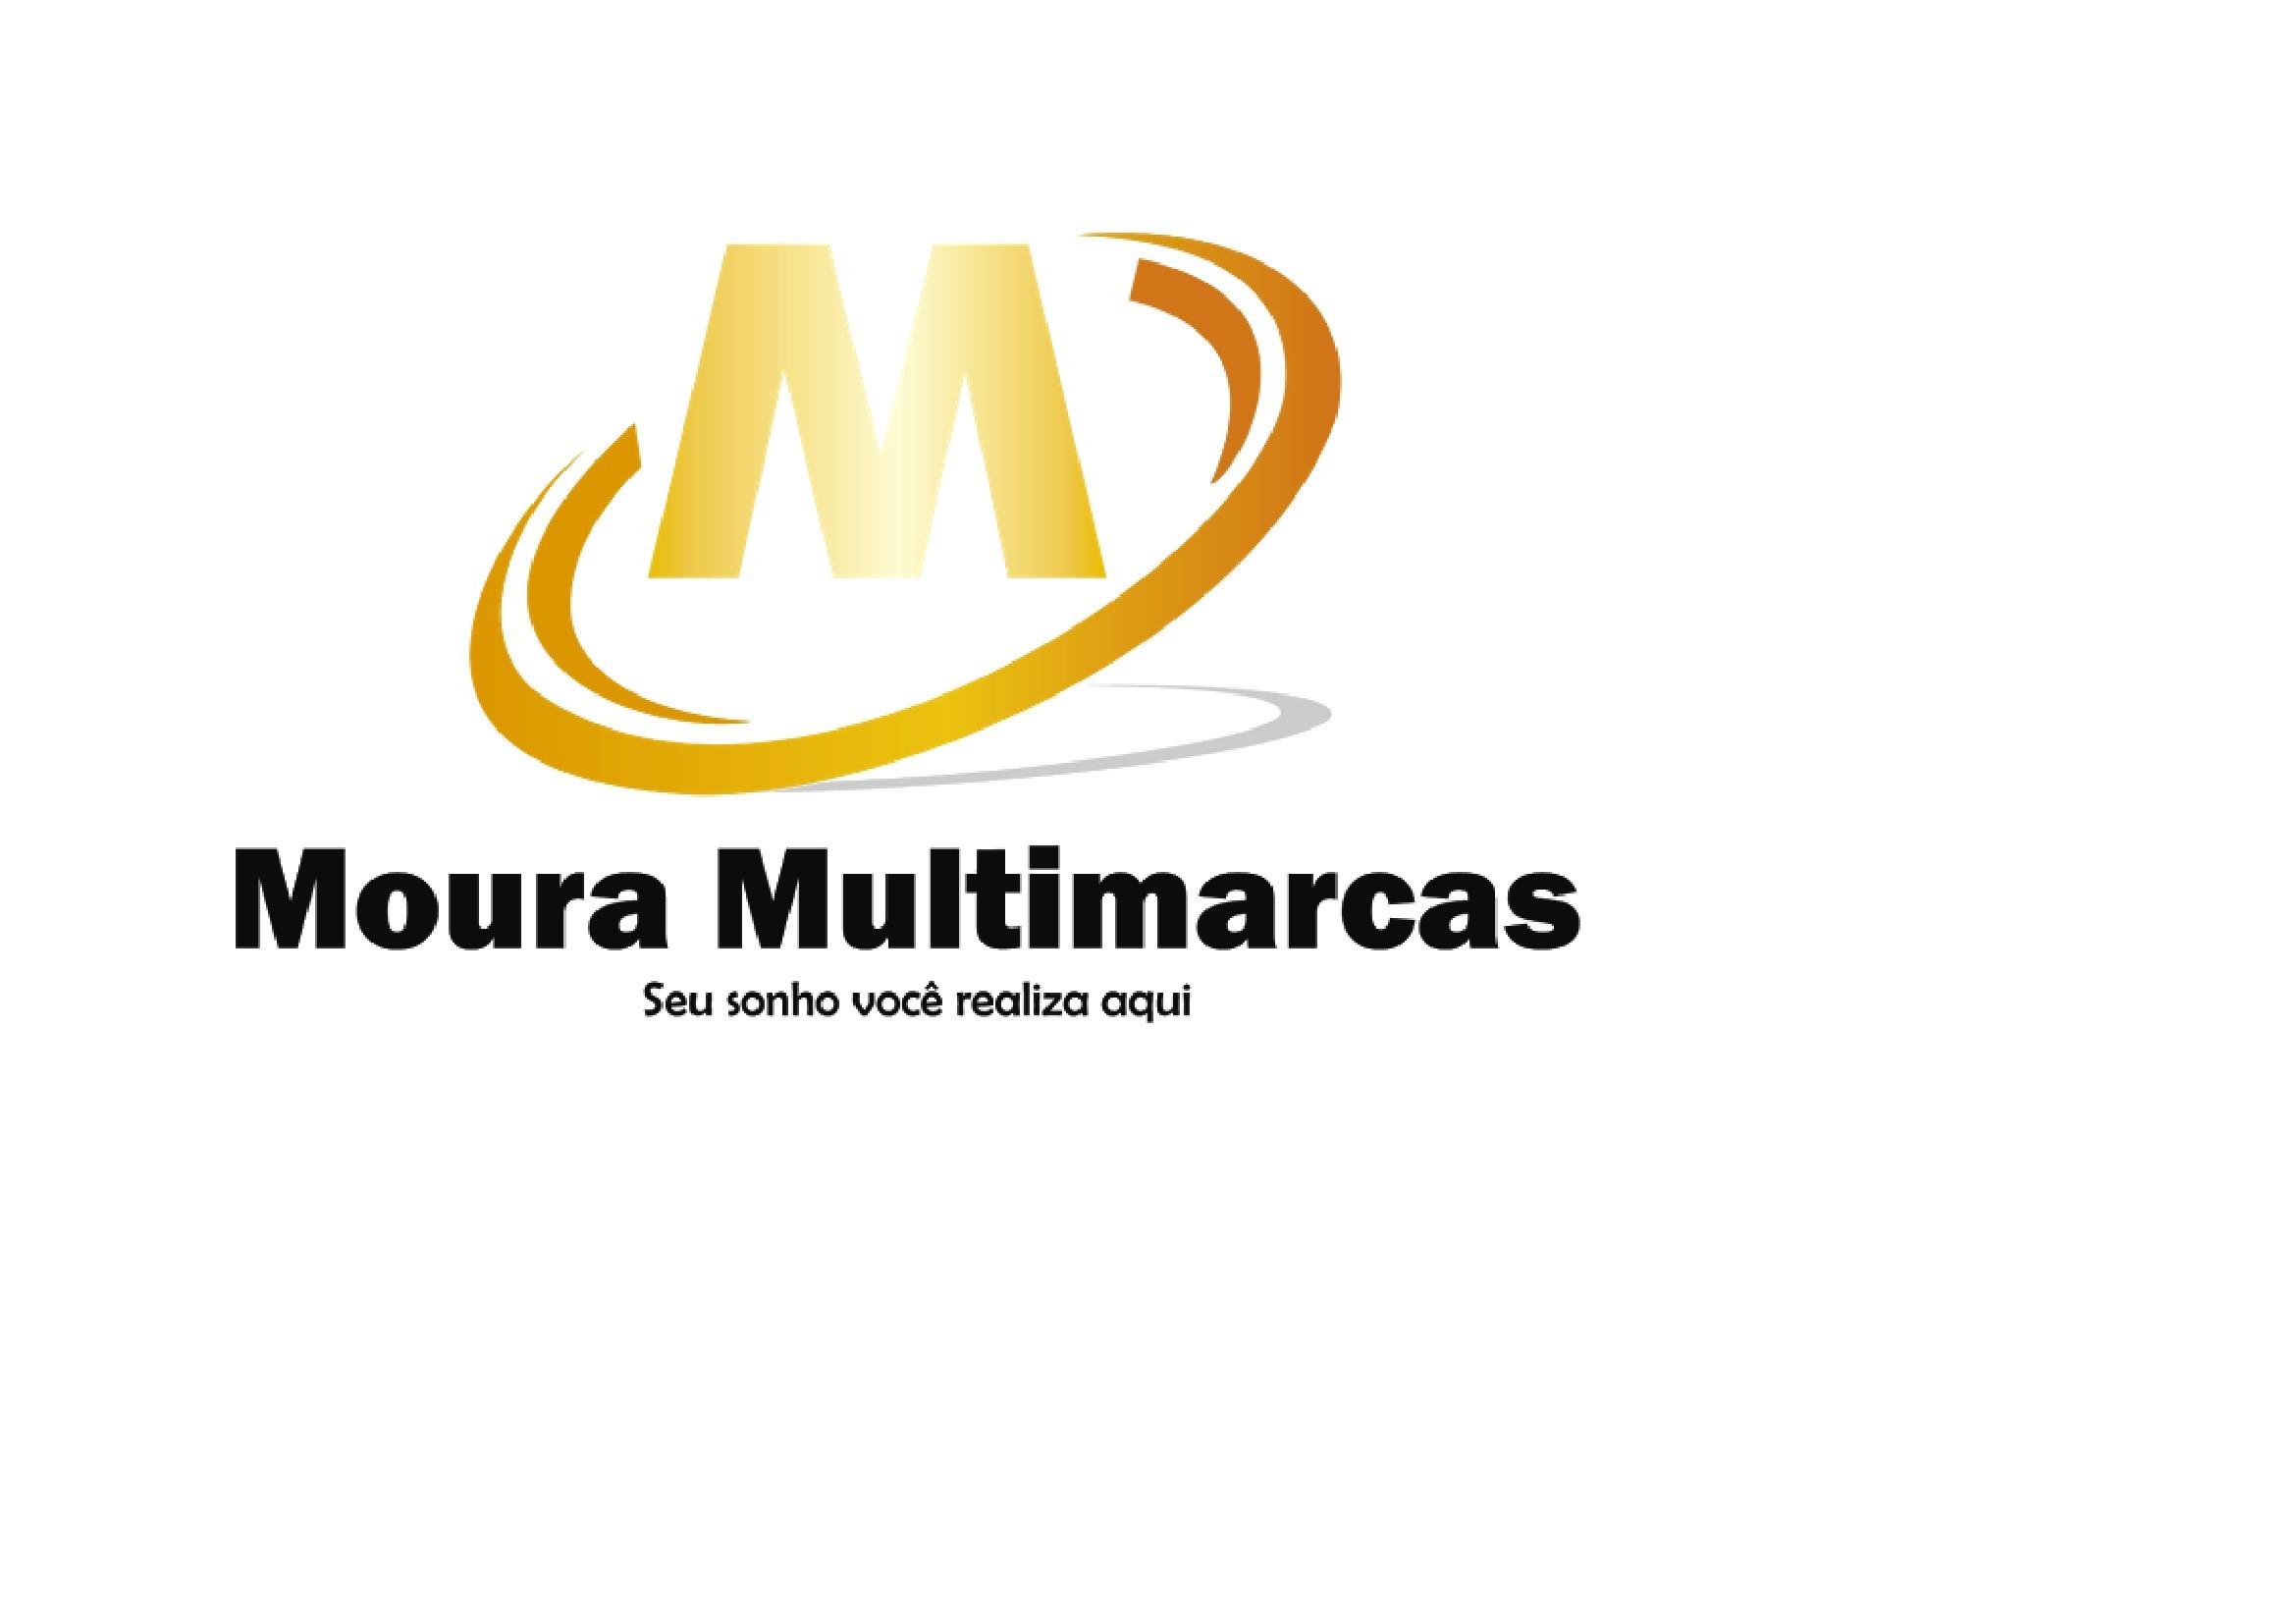 Moura Multimarcas